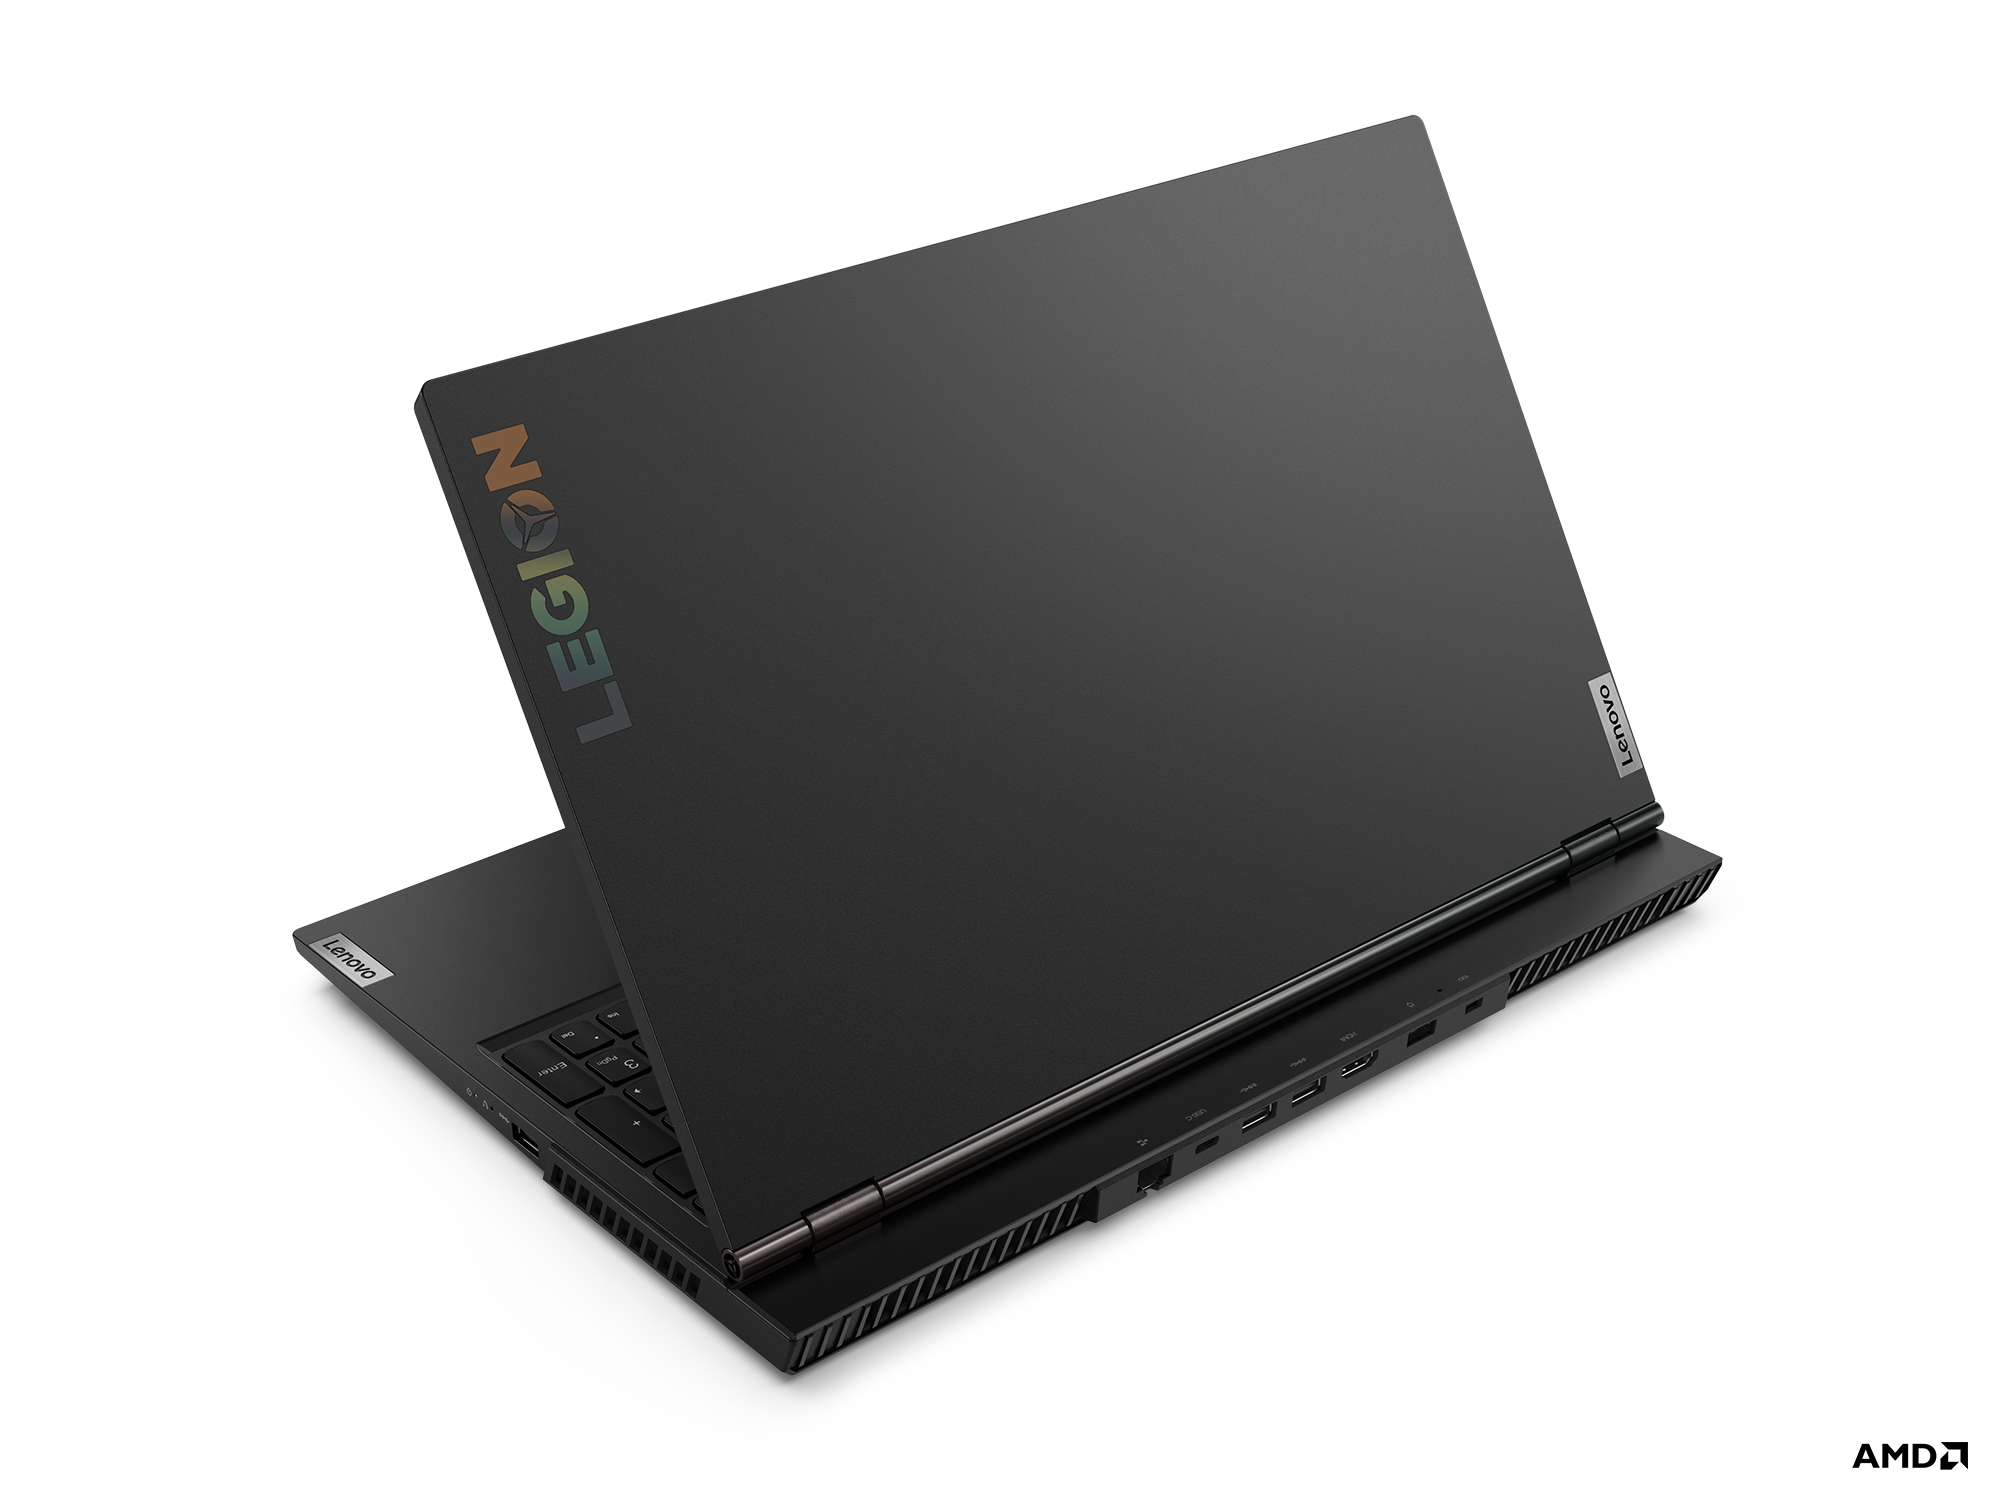 Lenovo brings AMD Ryzen options to its Legion PCs 17